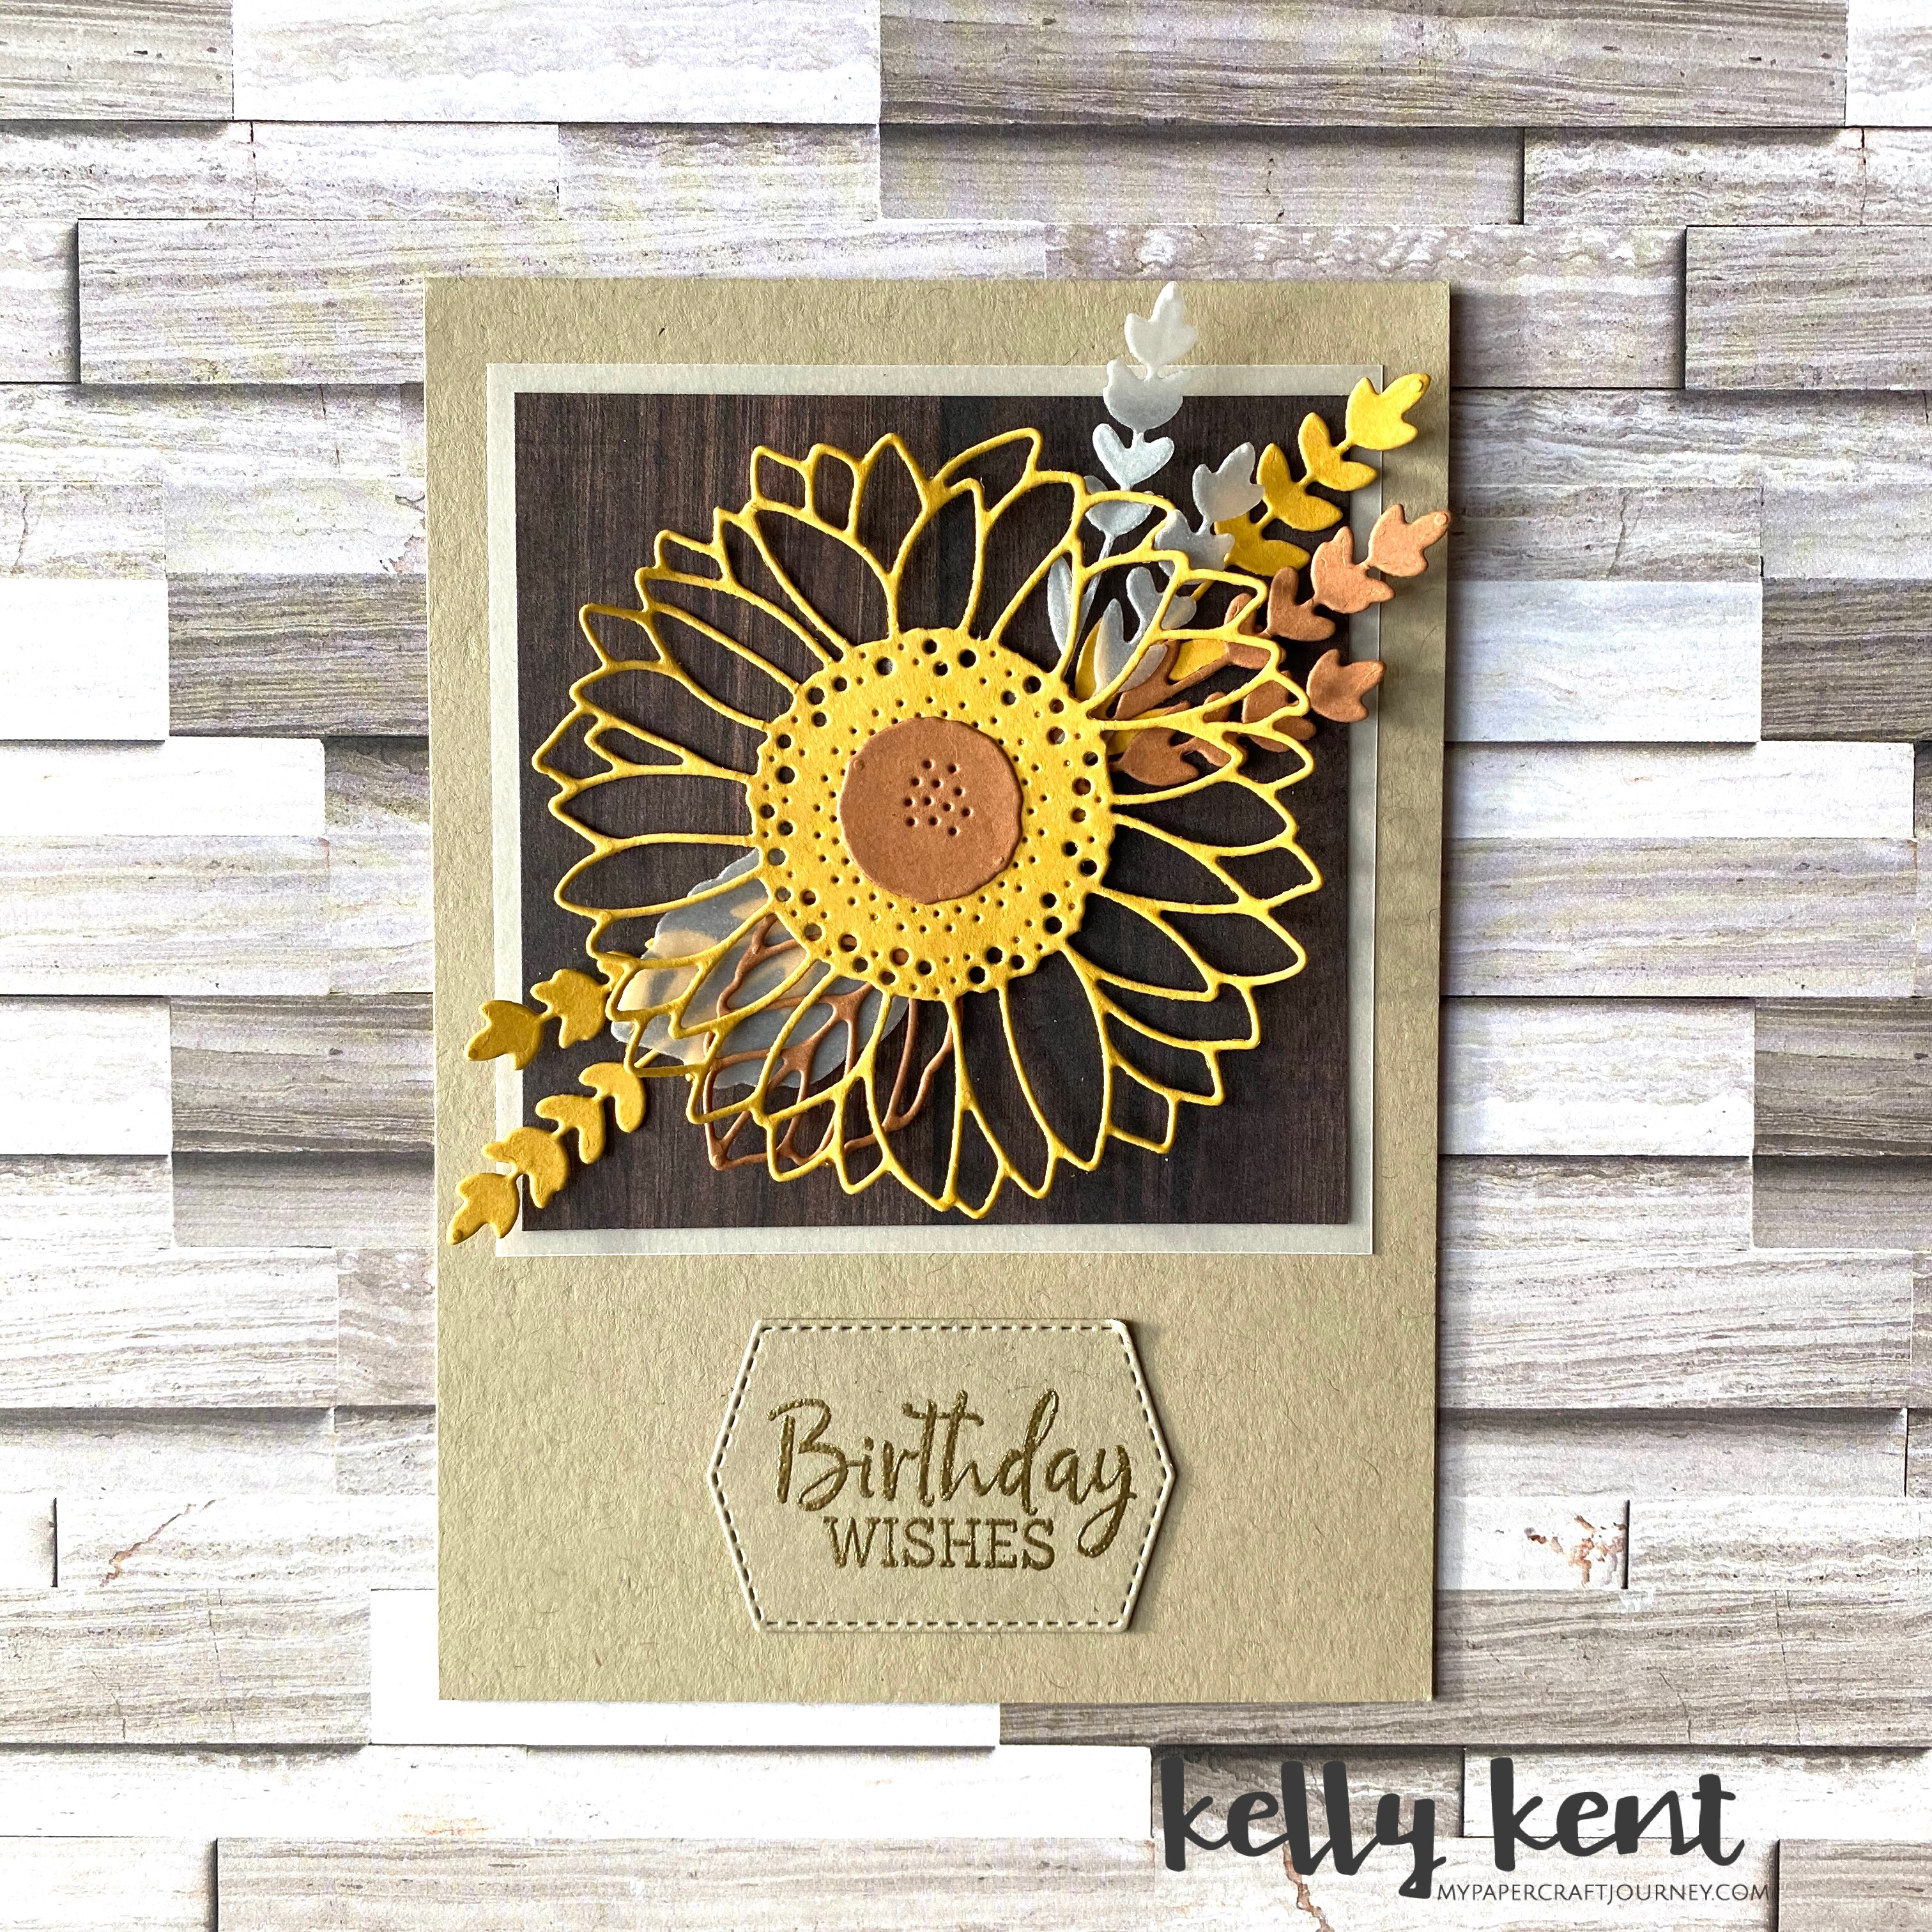 Sunflowers | kelly kent